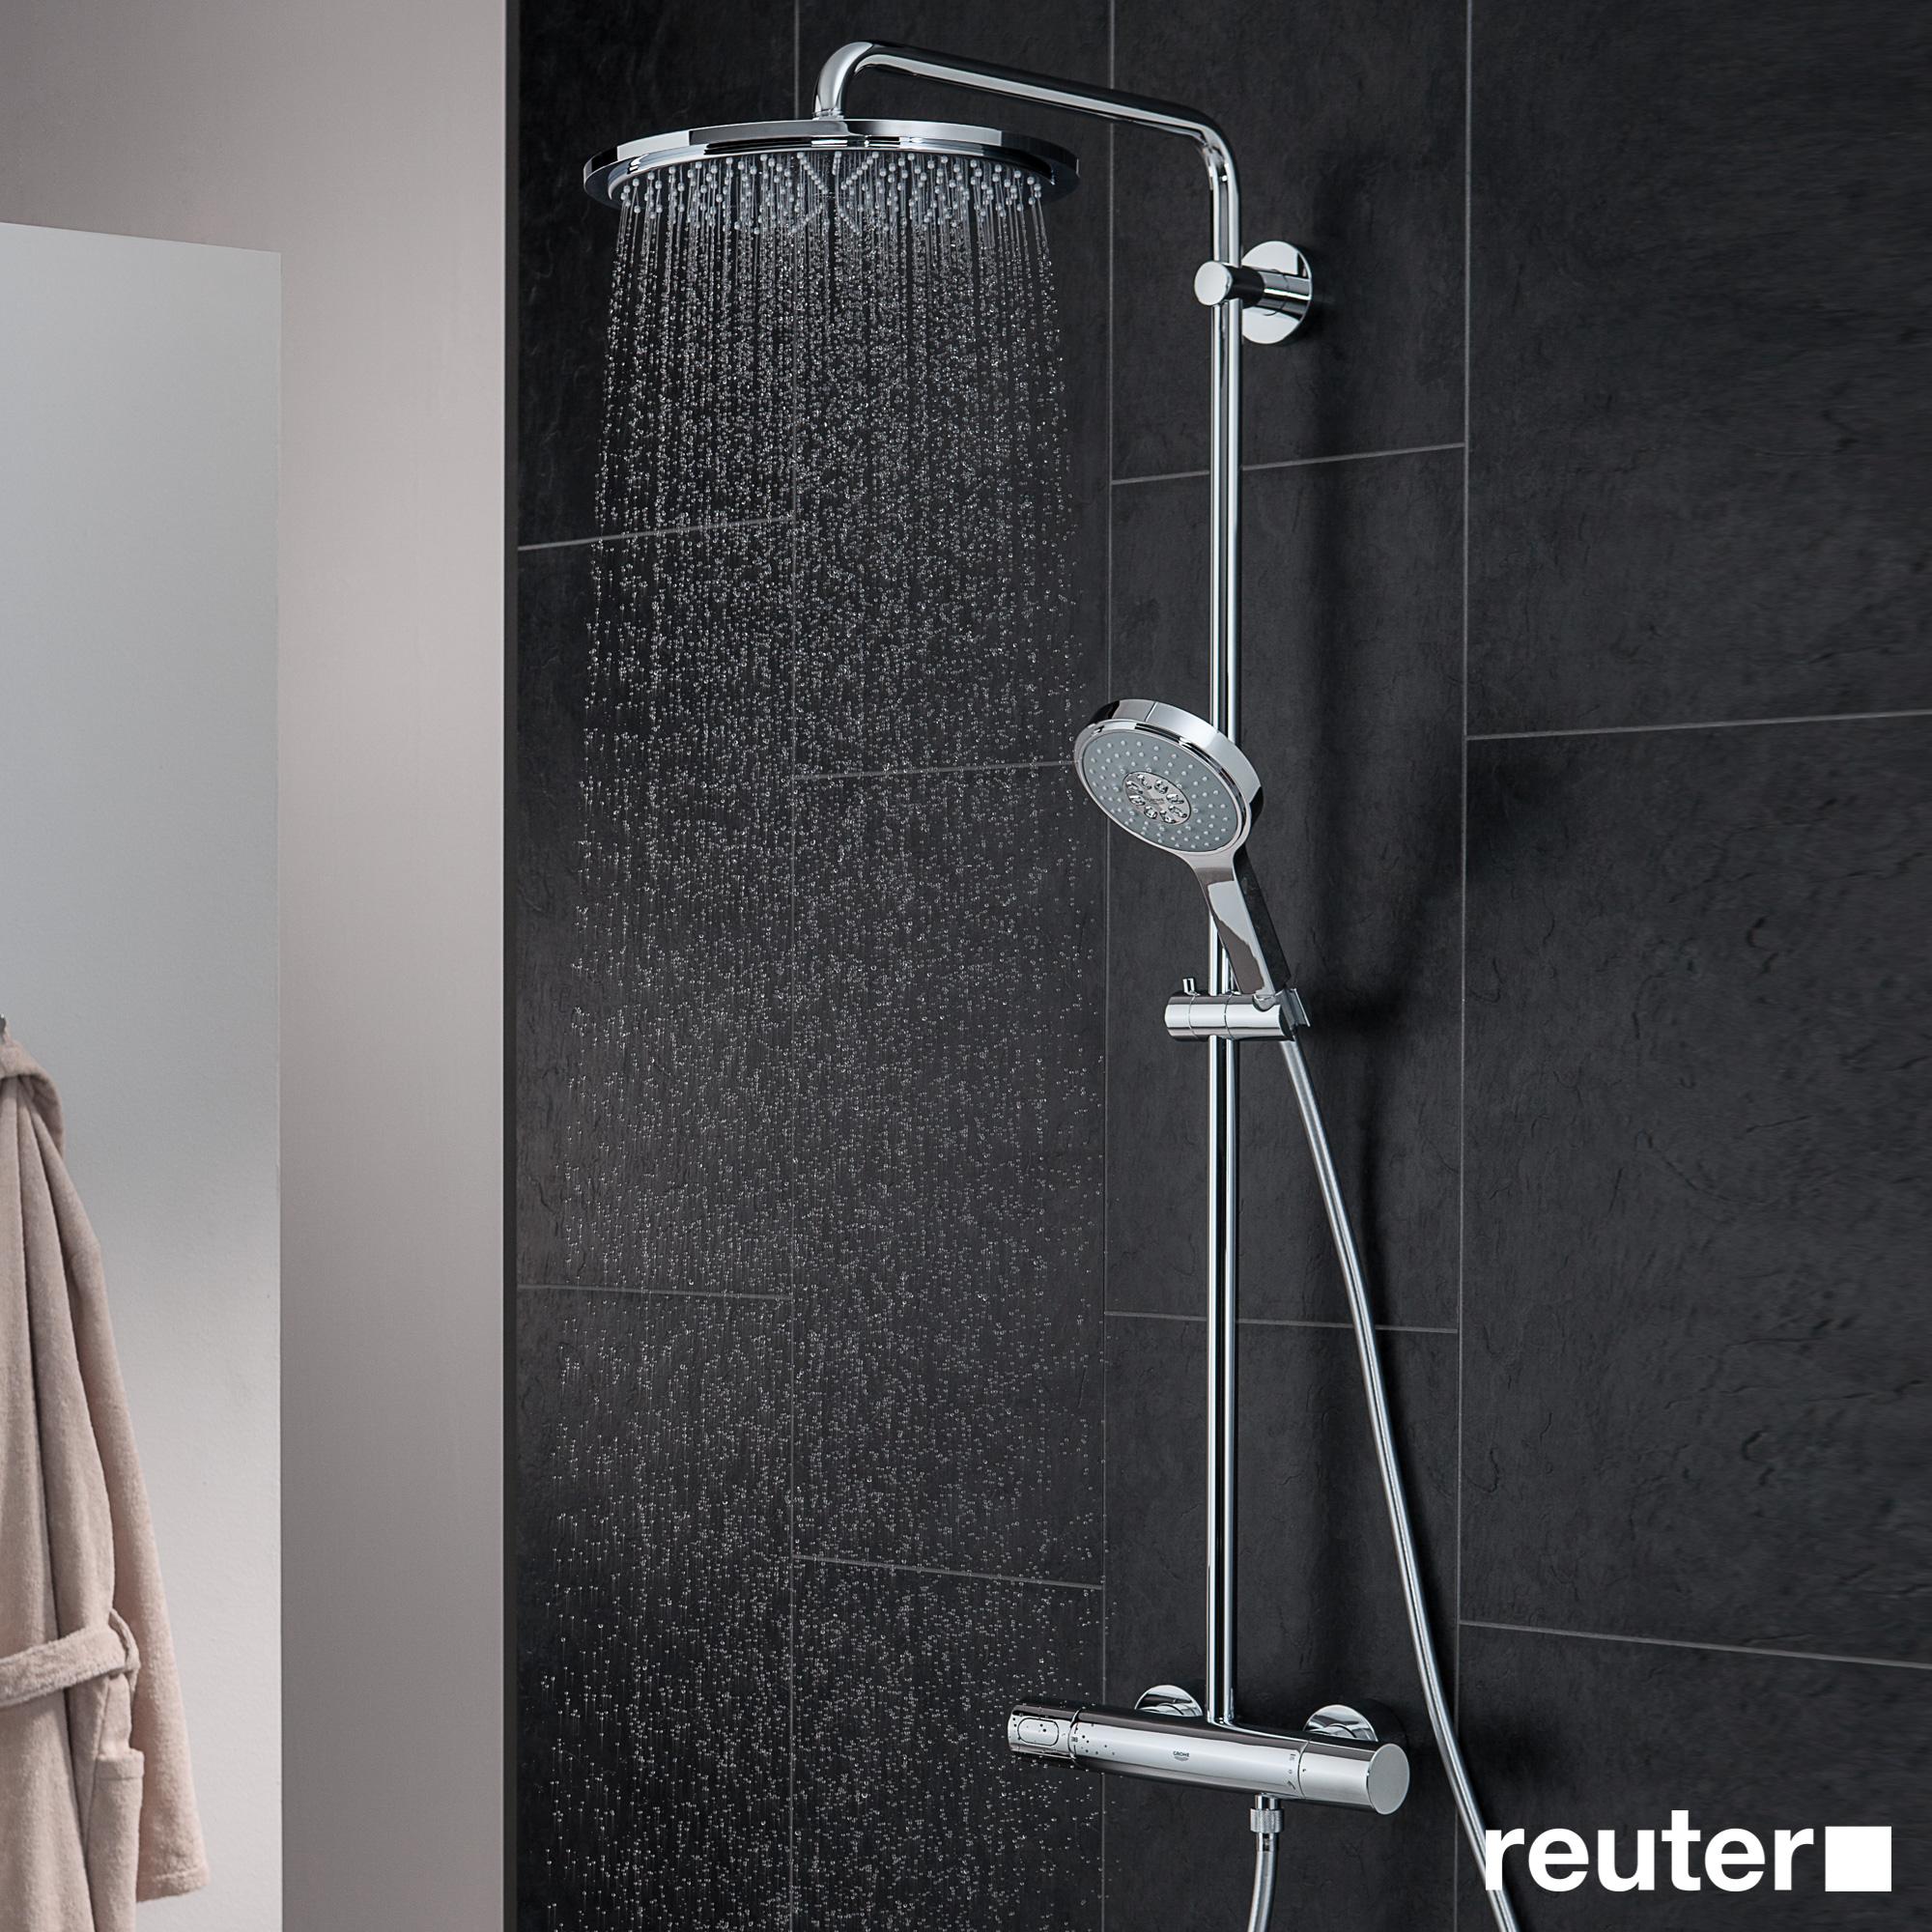 grohe rainshower system 310 duschsystem mit thermostatbatterie f r wandmontage 27968000. Black Bedroom Furniture Sets. Home Design Ideas